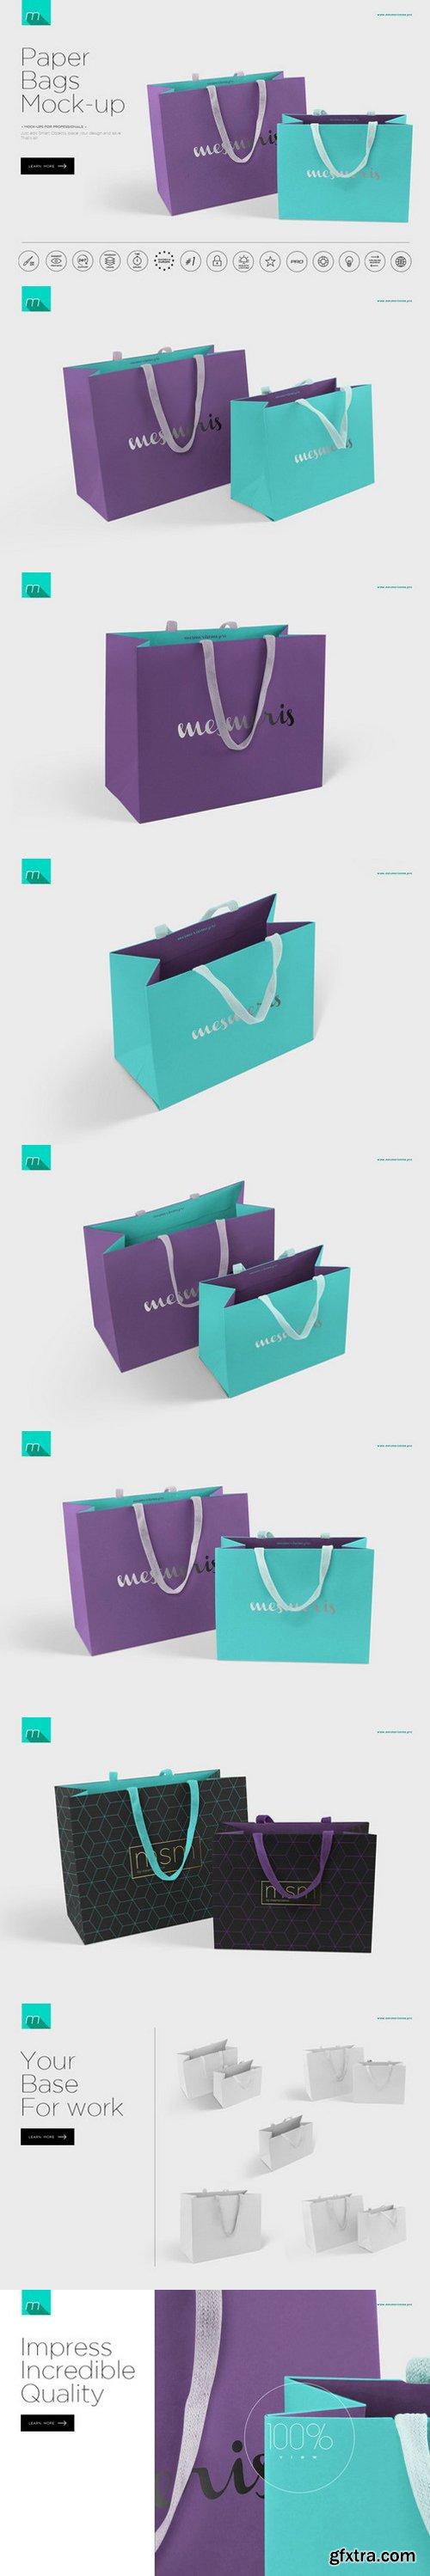 CM - Paper Bags Mock-up 495830